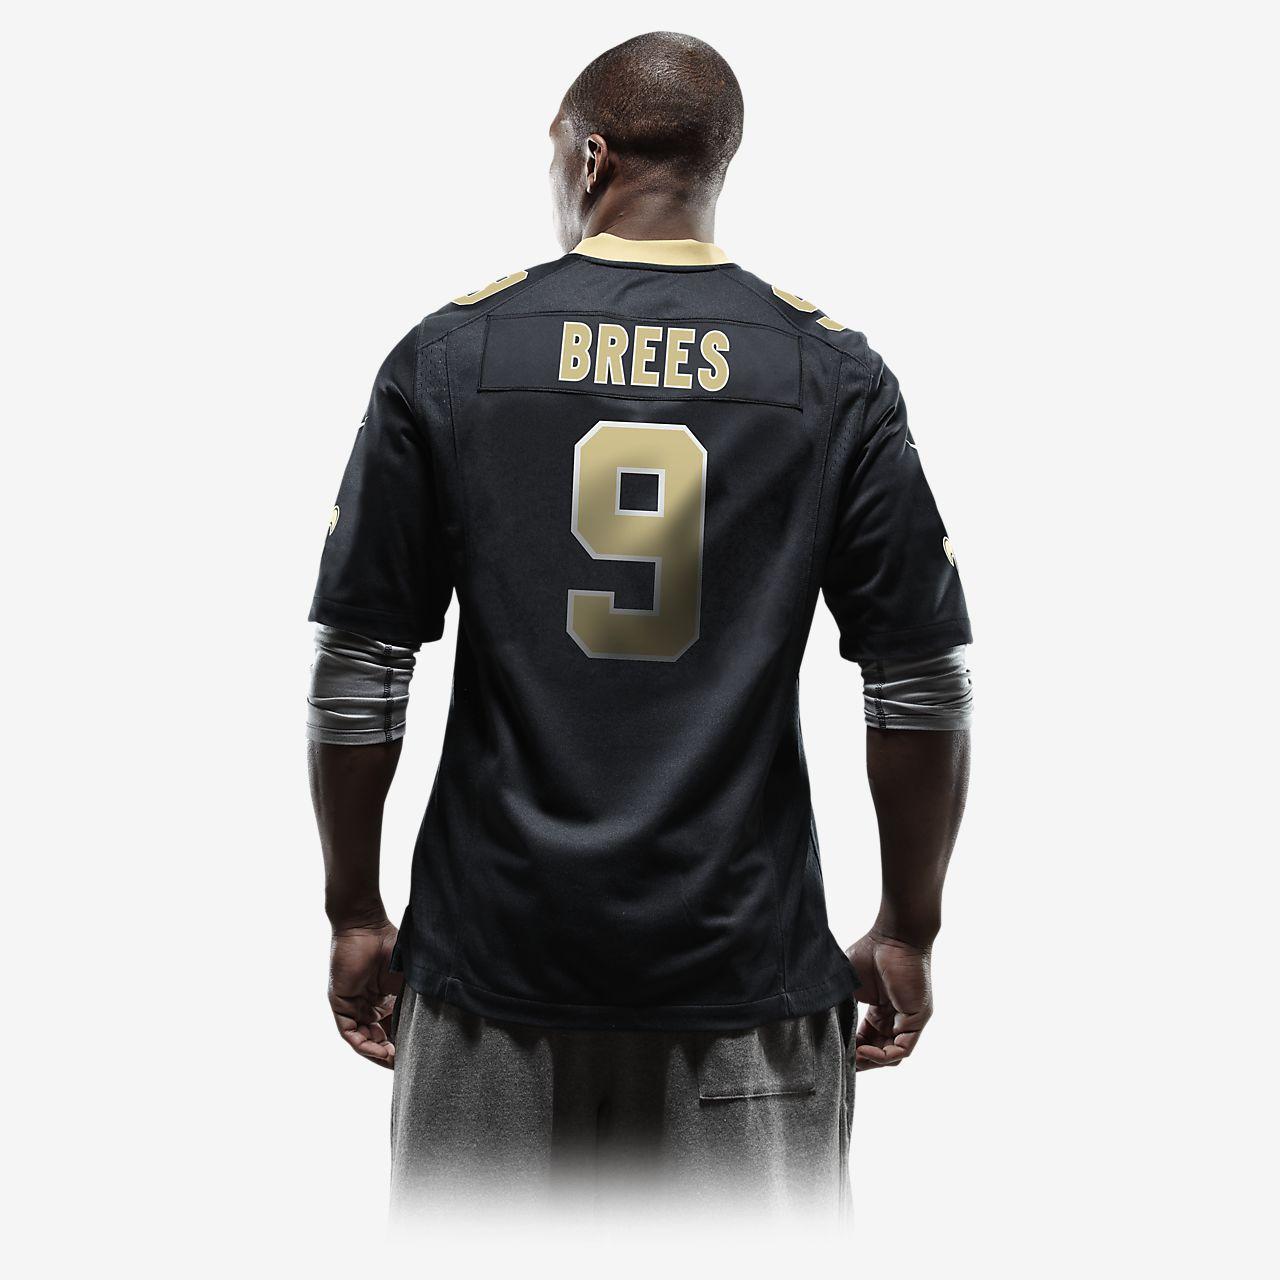 save off 02237 9fce8 NFL New Orleans Saints (Drew Brees) American Football Herren-Heimtrikot